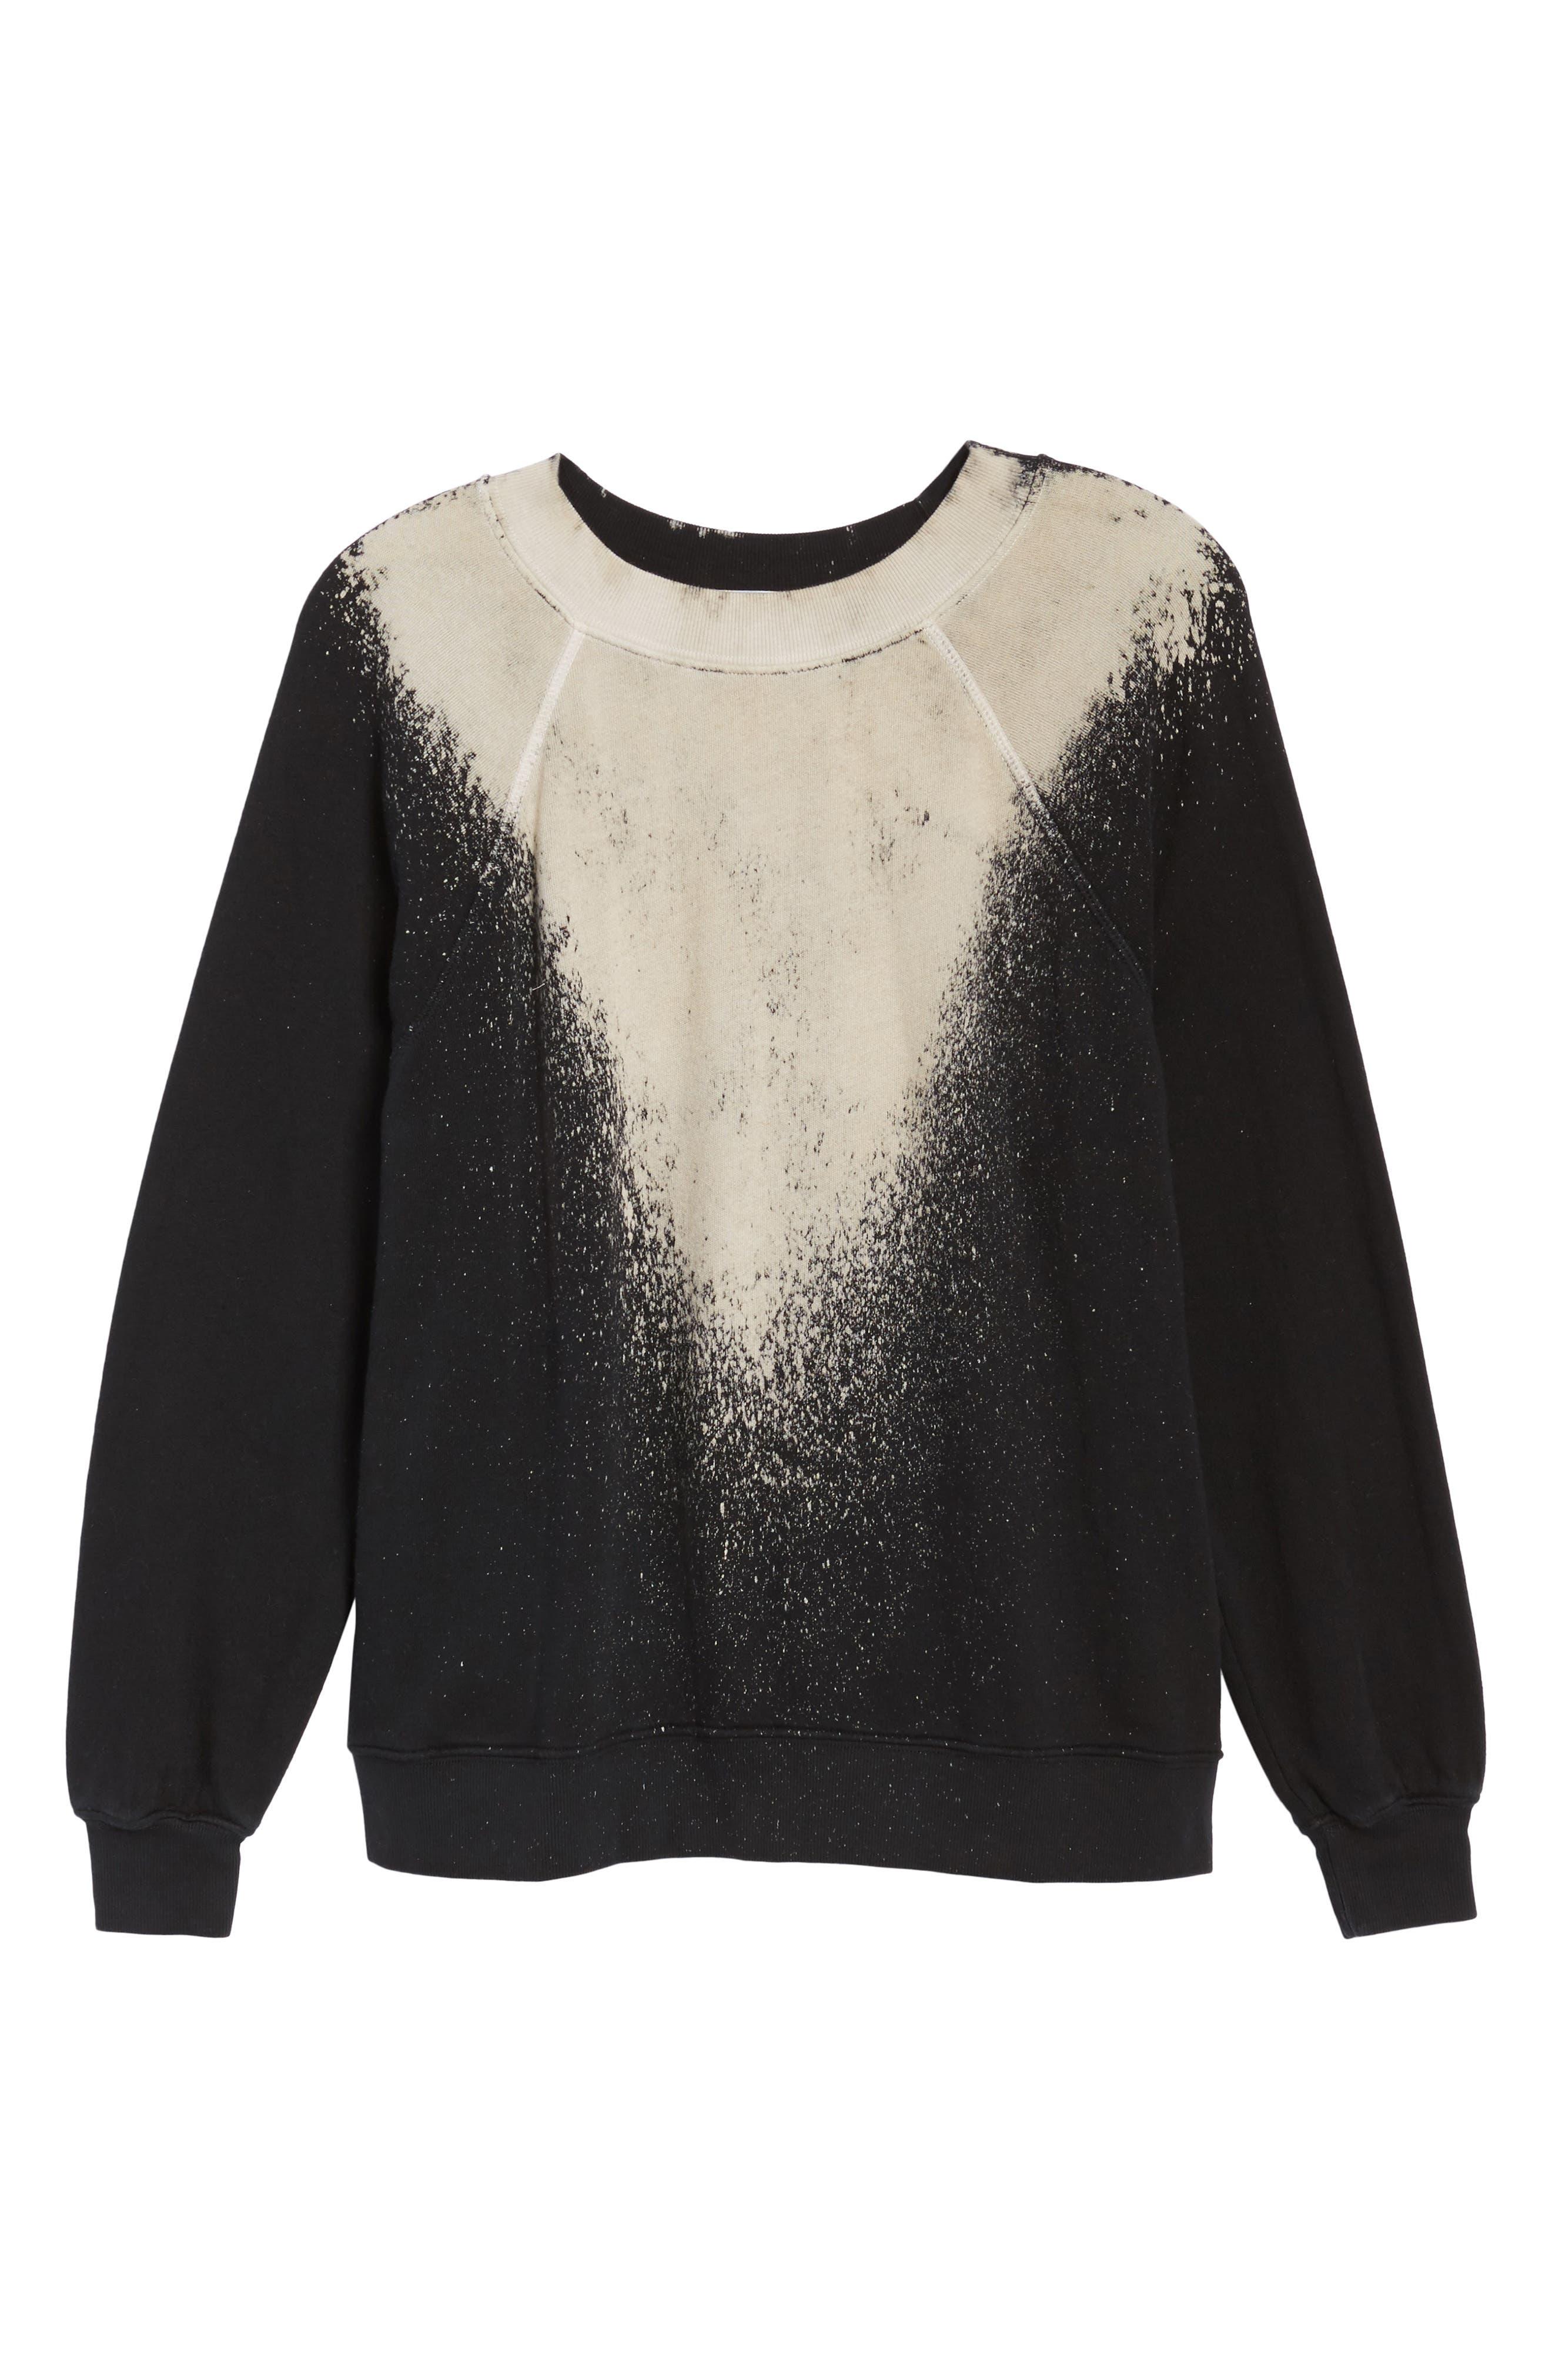 Stardust - Sommers Sweatshirt,                             Alternate thumbnail 6, color,                             003